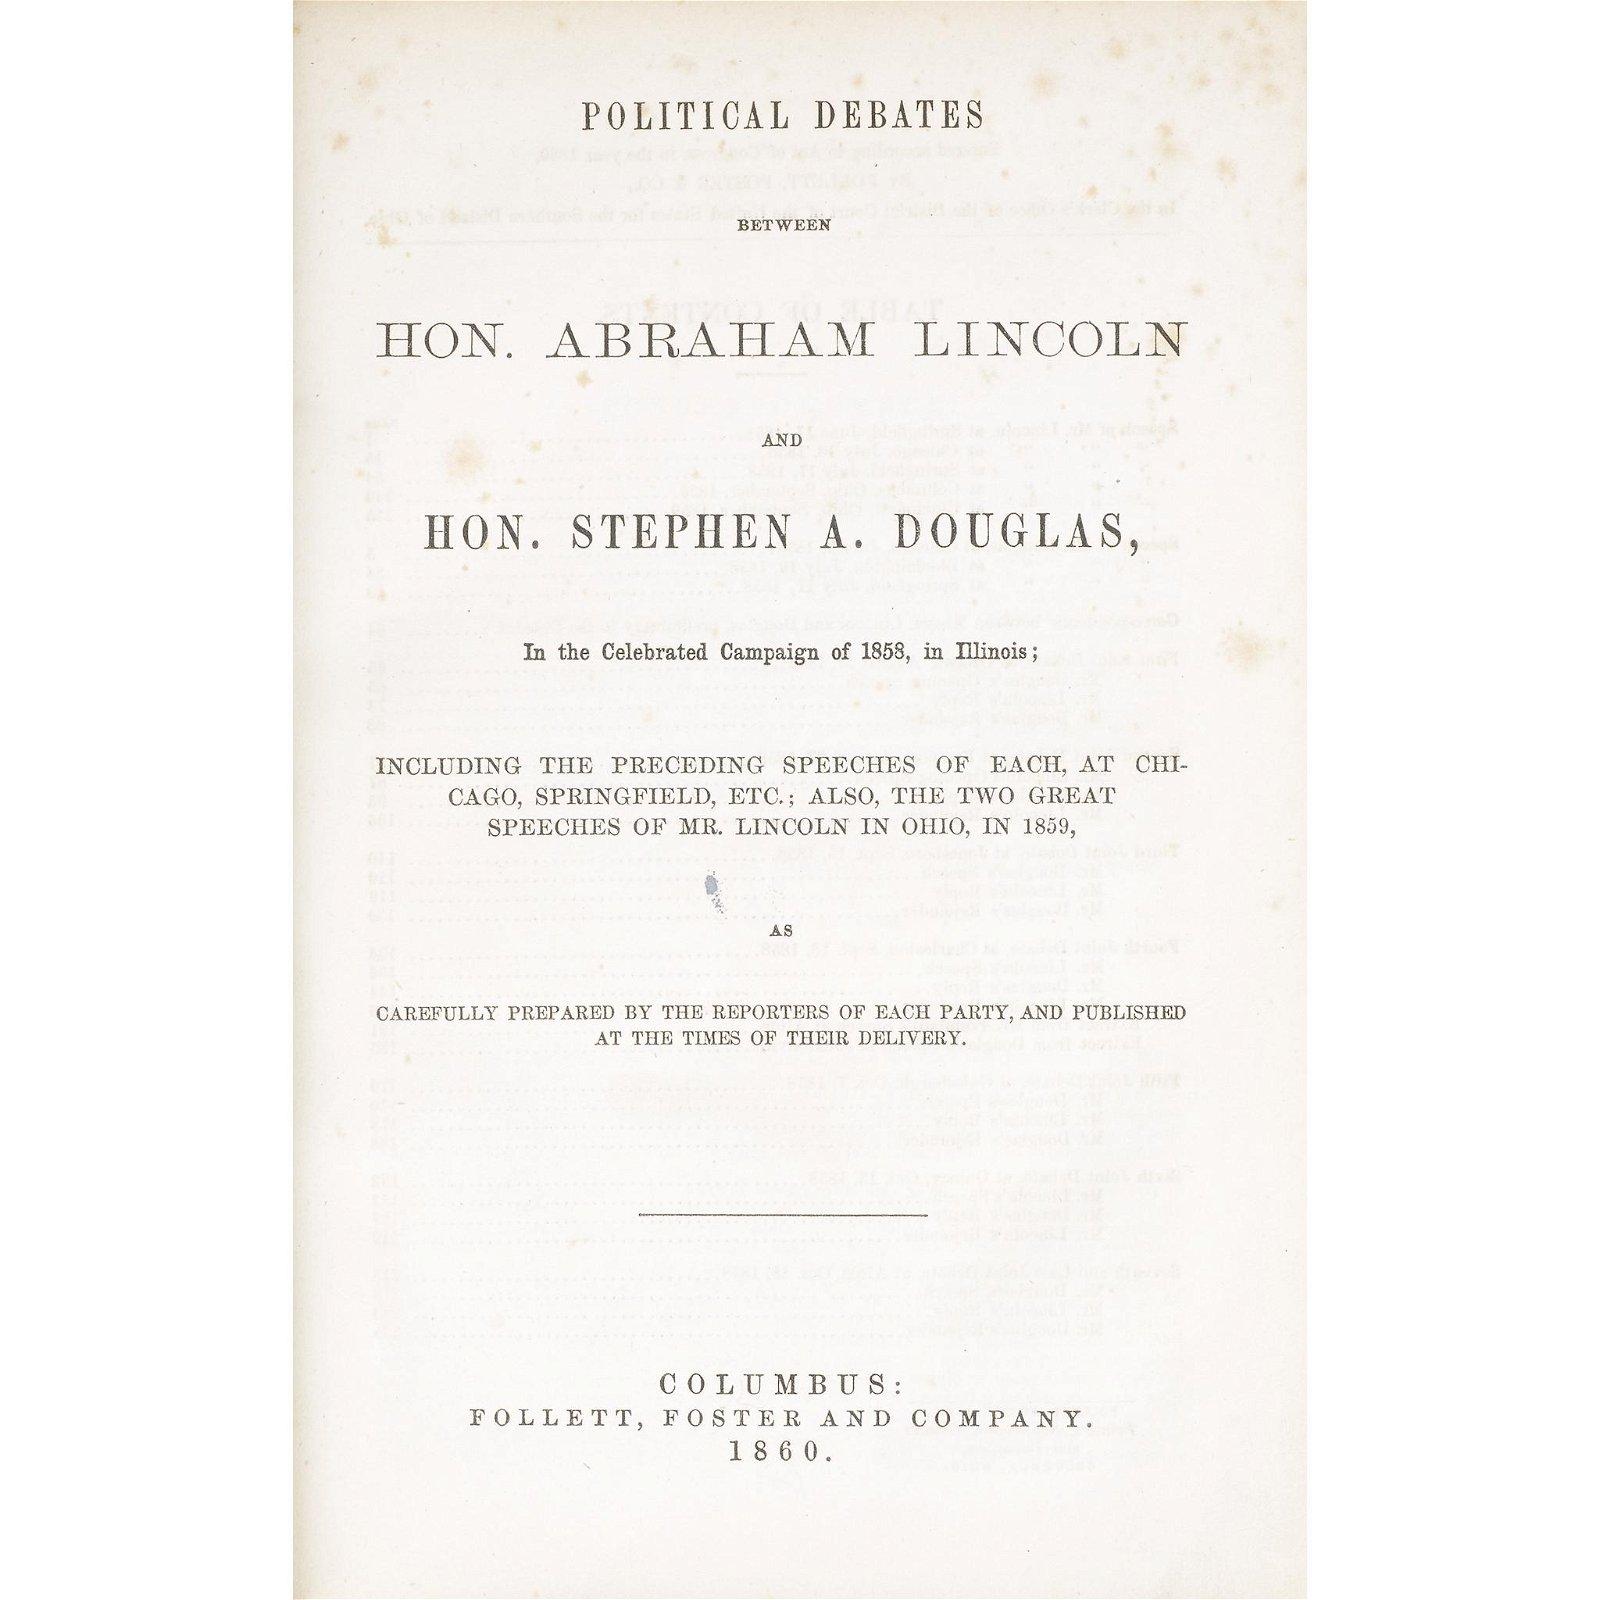 [Americana] [Lincoln, Abraham], Political Debates